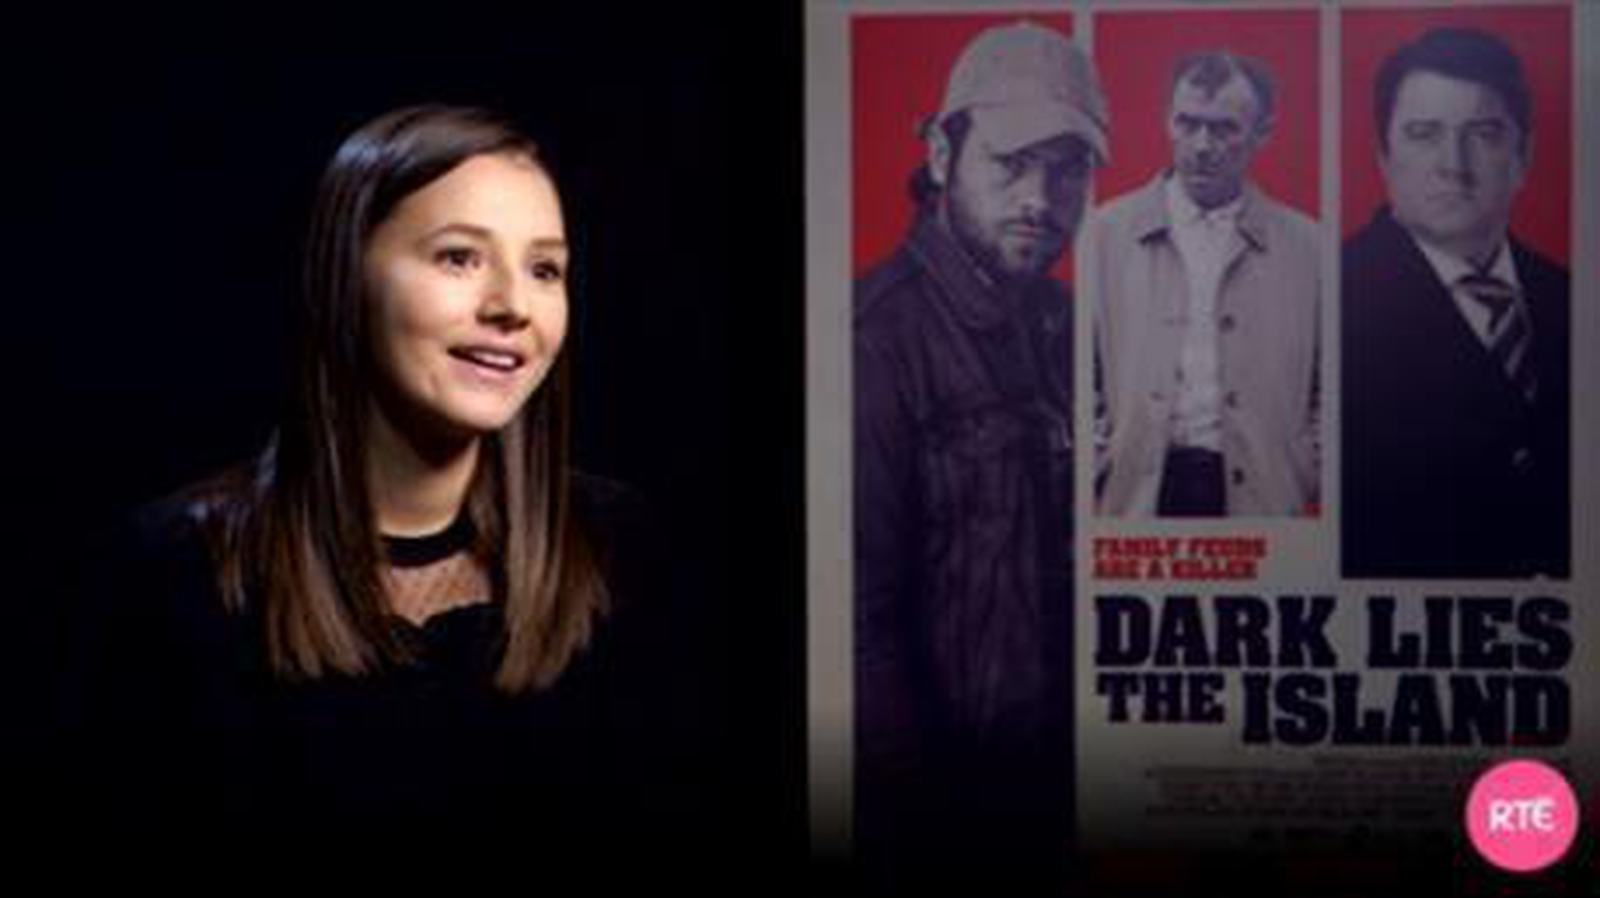 Charlie Murphy on making Dark Lies the Island